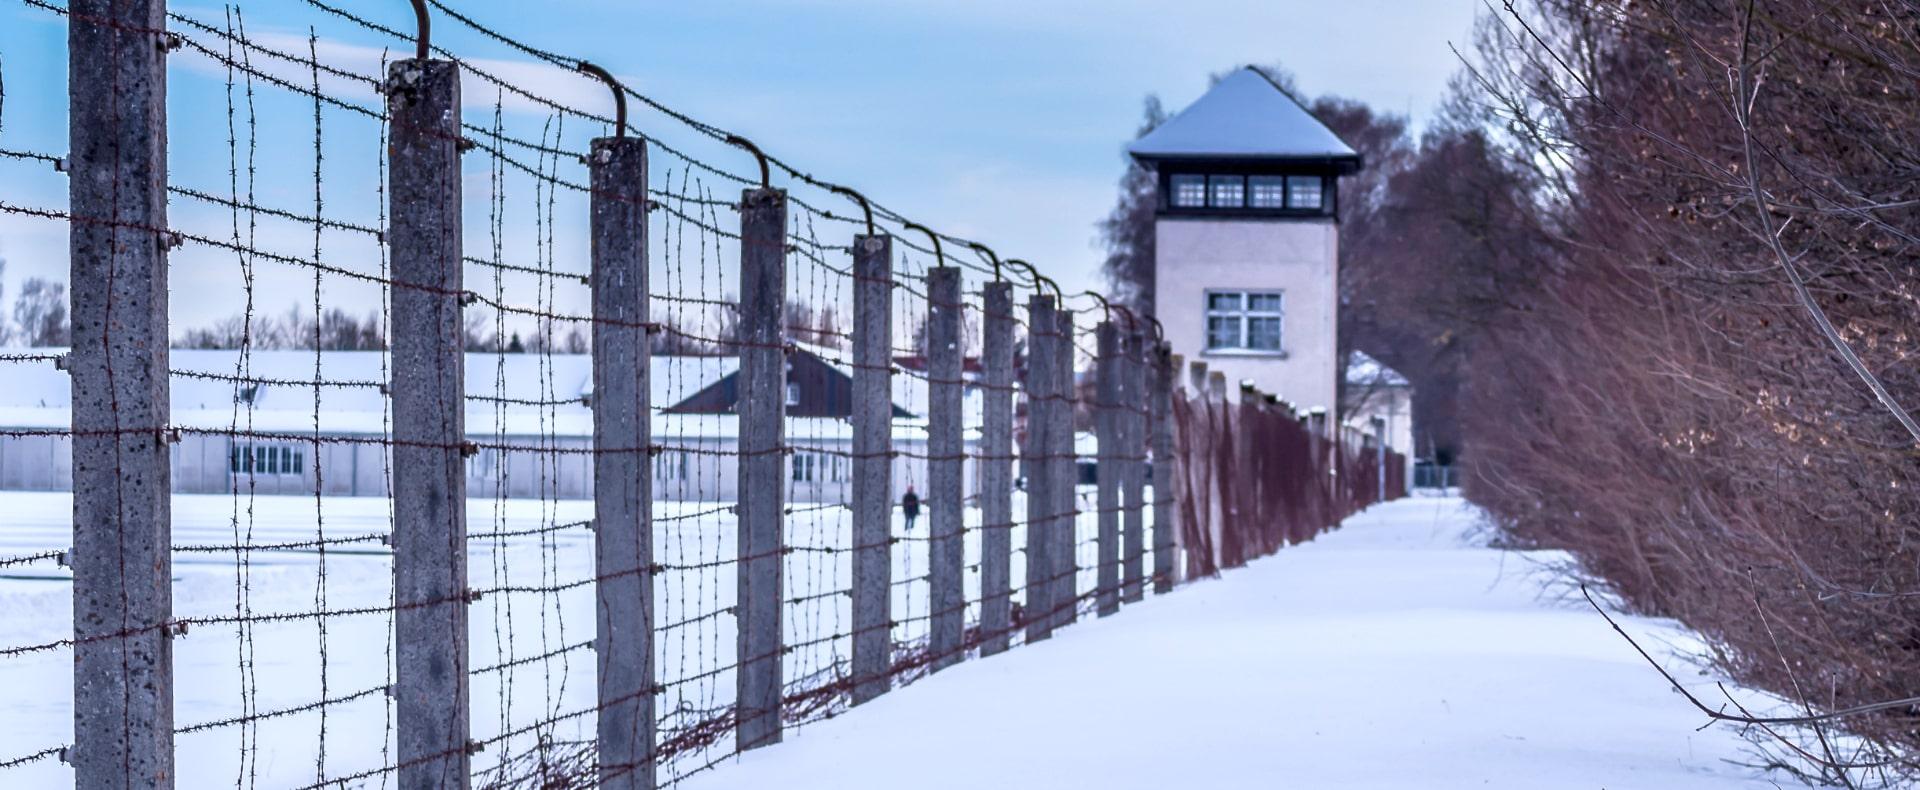 Concentration Camp Memorial